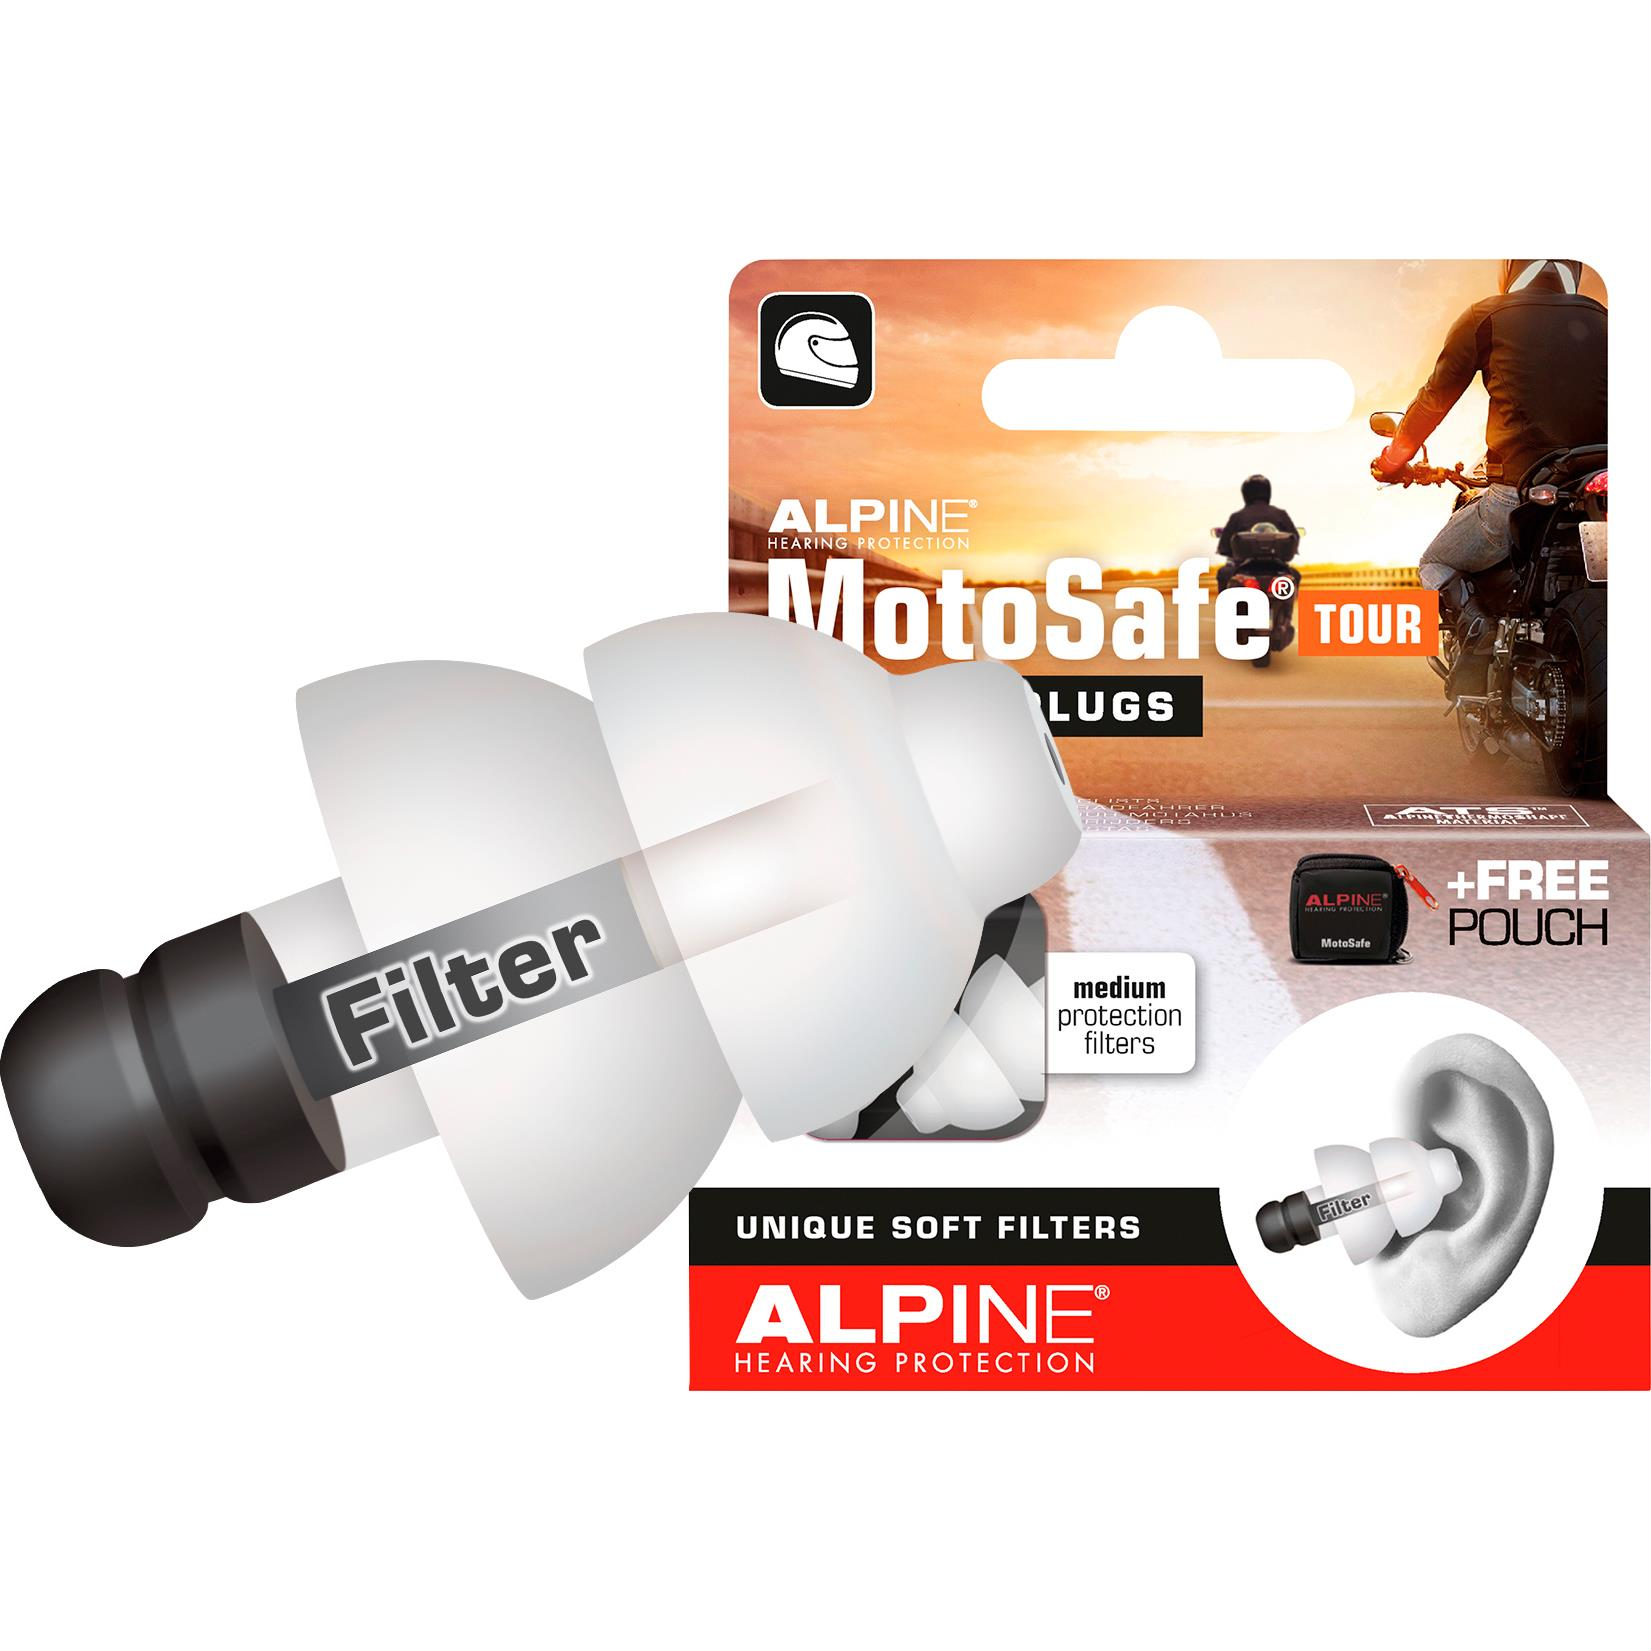 Image of Alpine Motosafe Tour